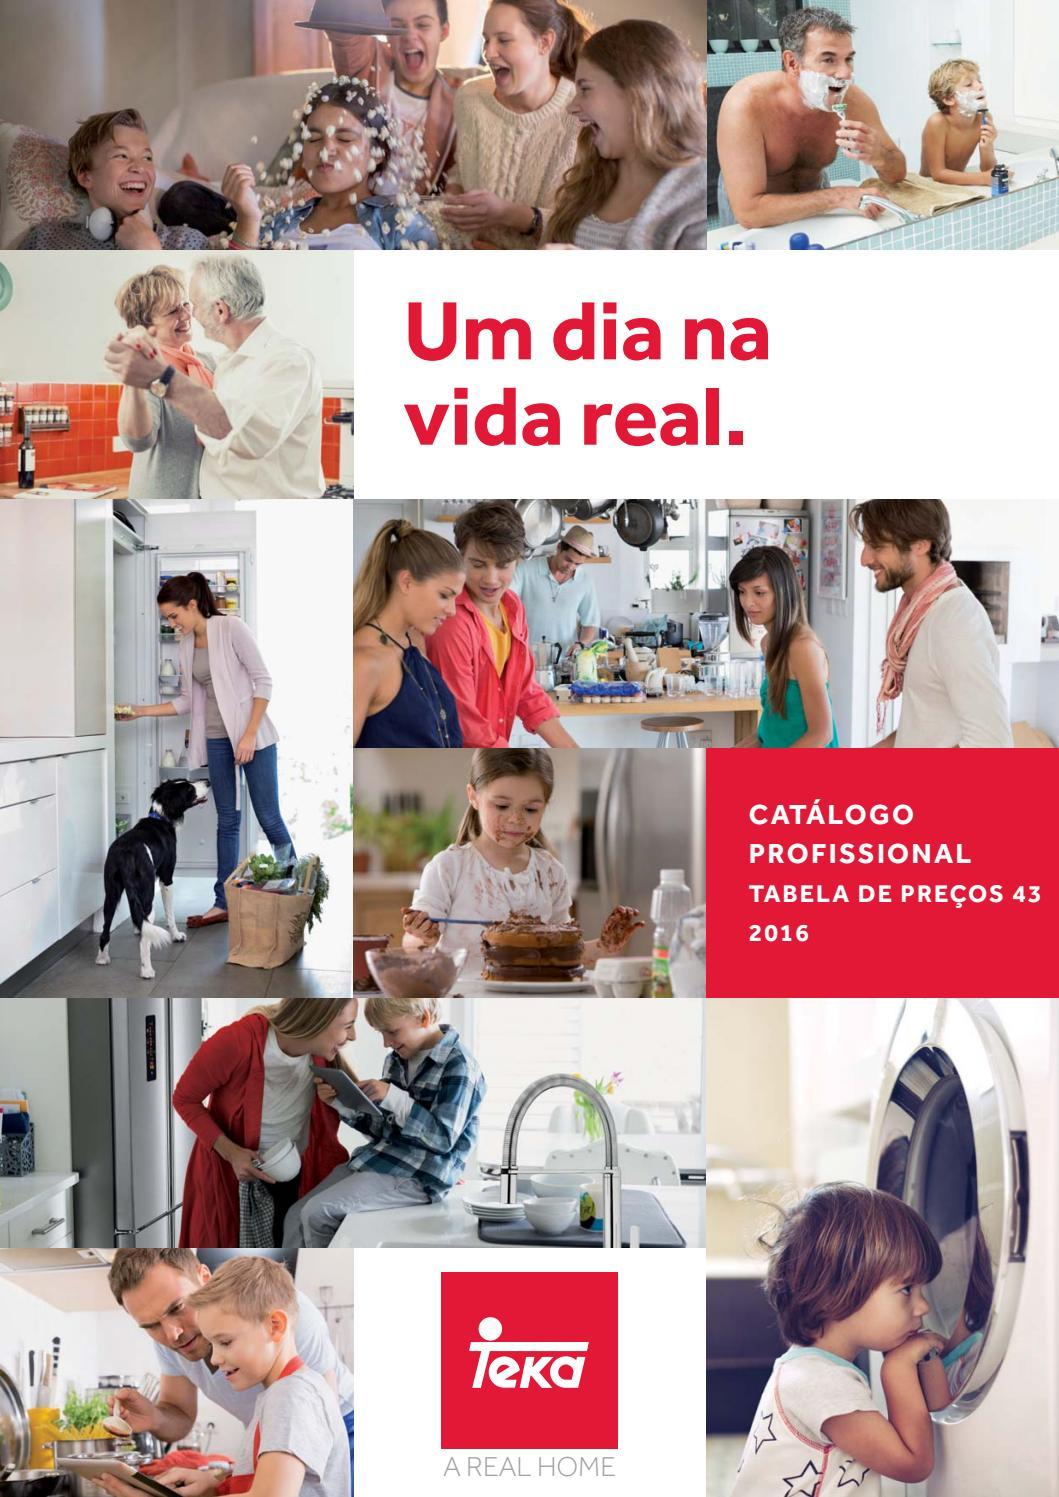 Cat logo profissional teka 2016 by teka portugal issuu - Catalogo de teka ...